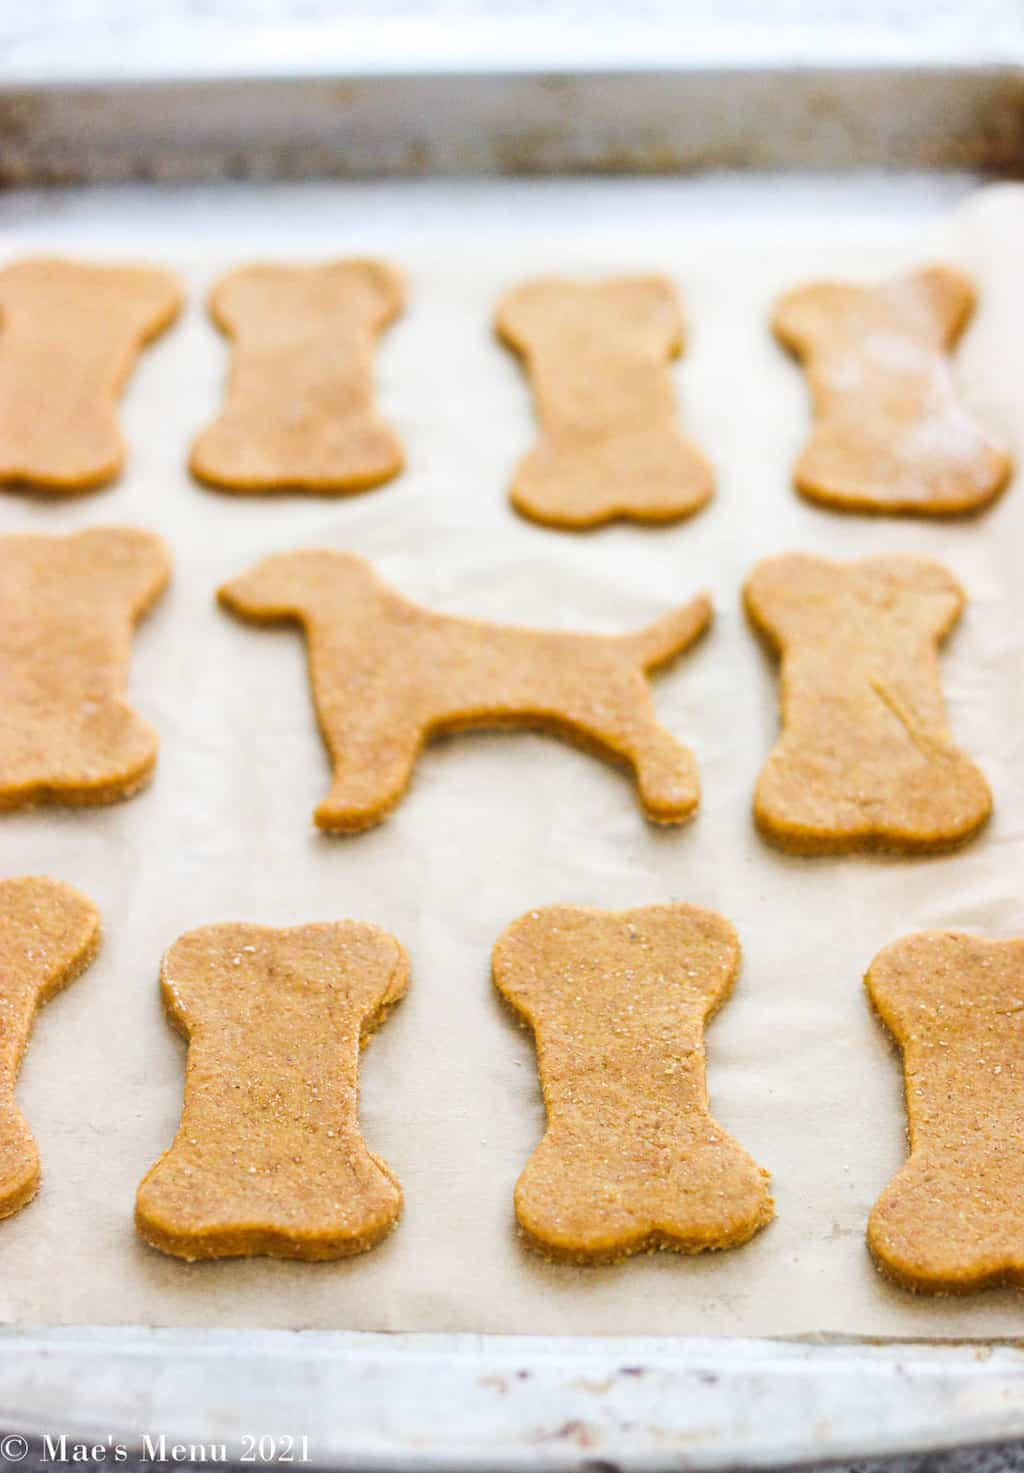 unbaked dog treats on a baking pan